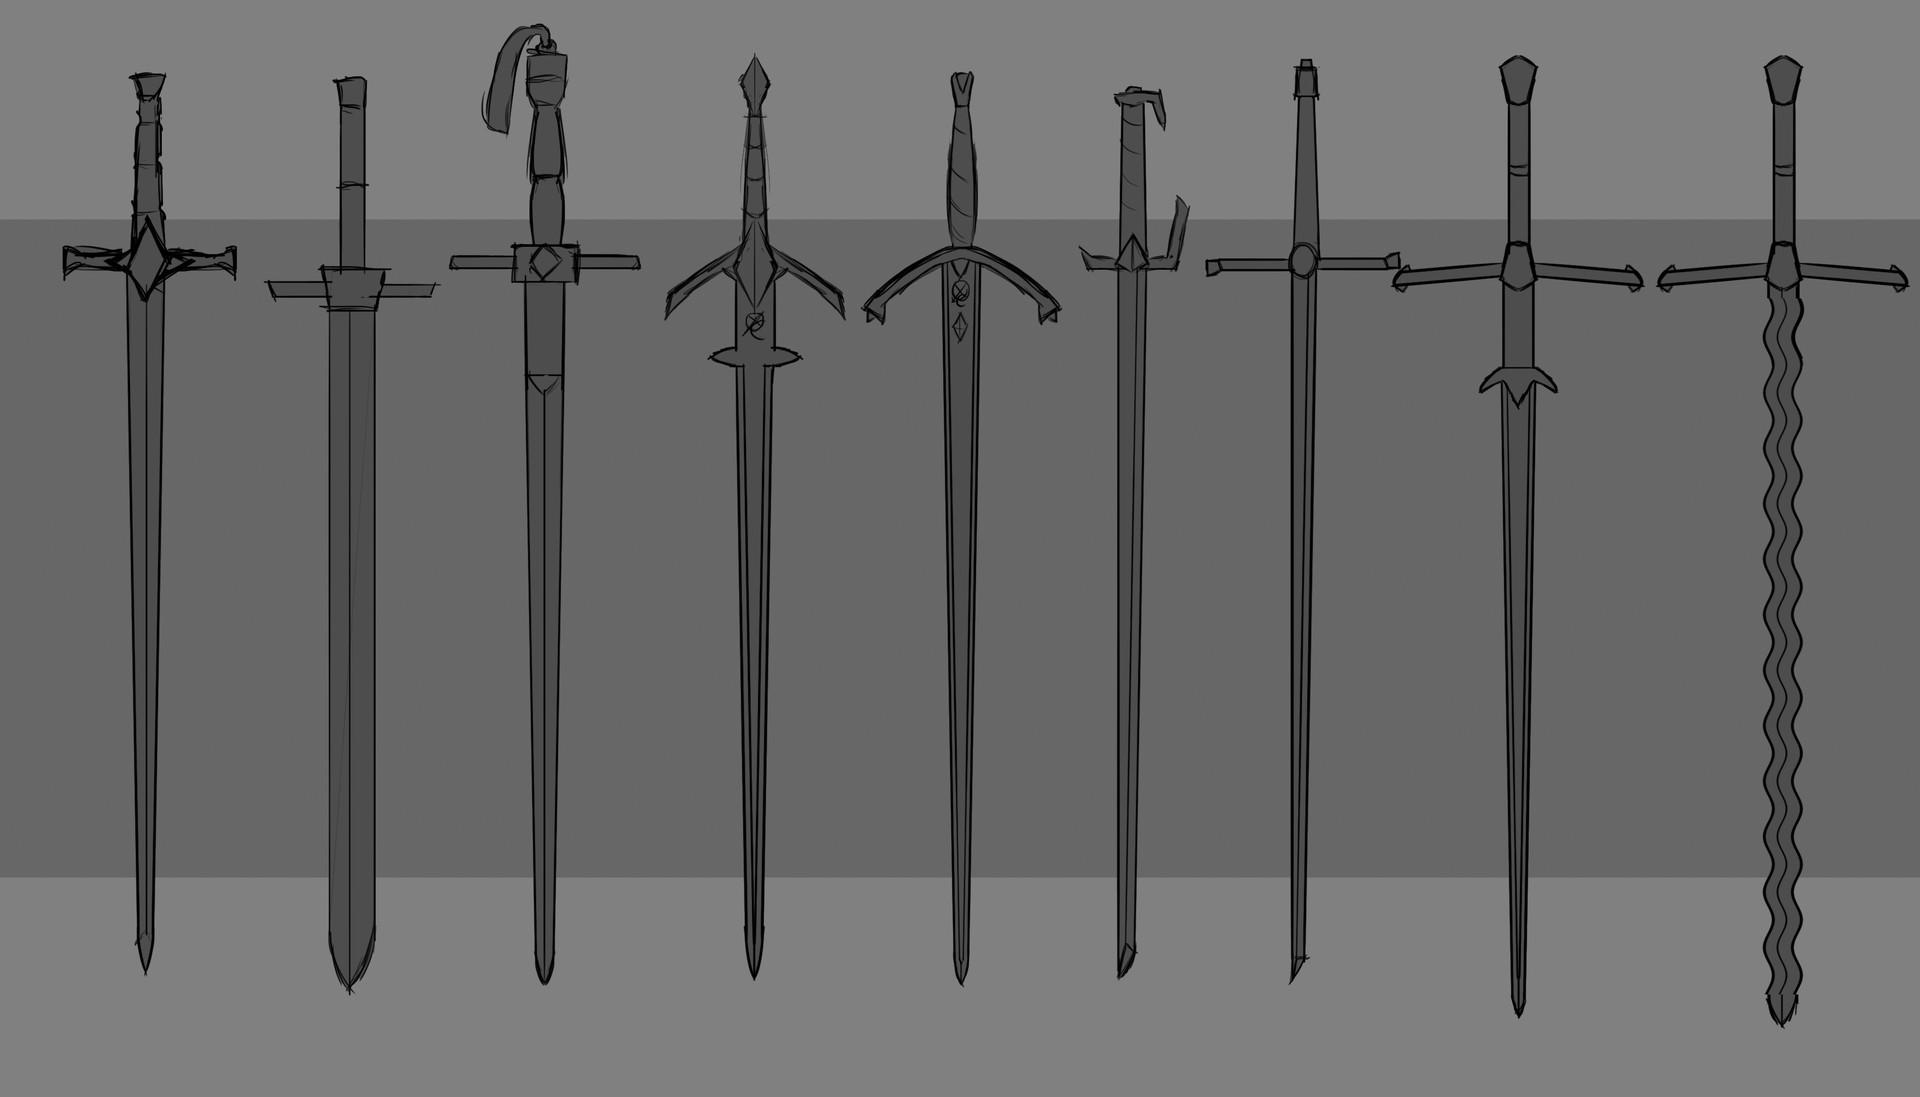 Hannah pallister 20170414 thea sword designs 1